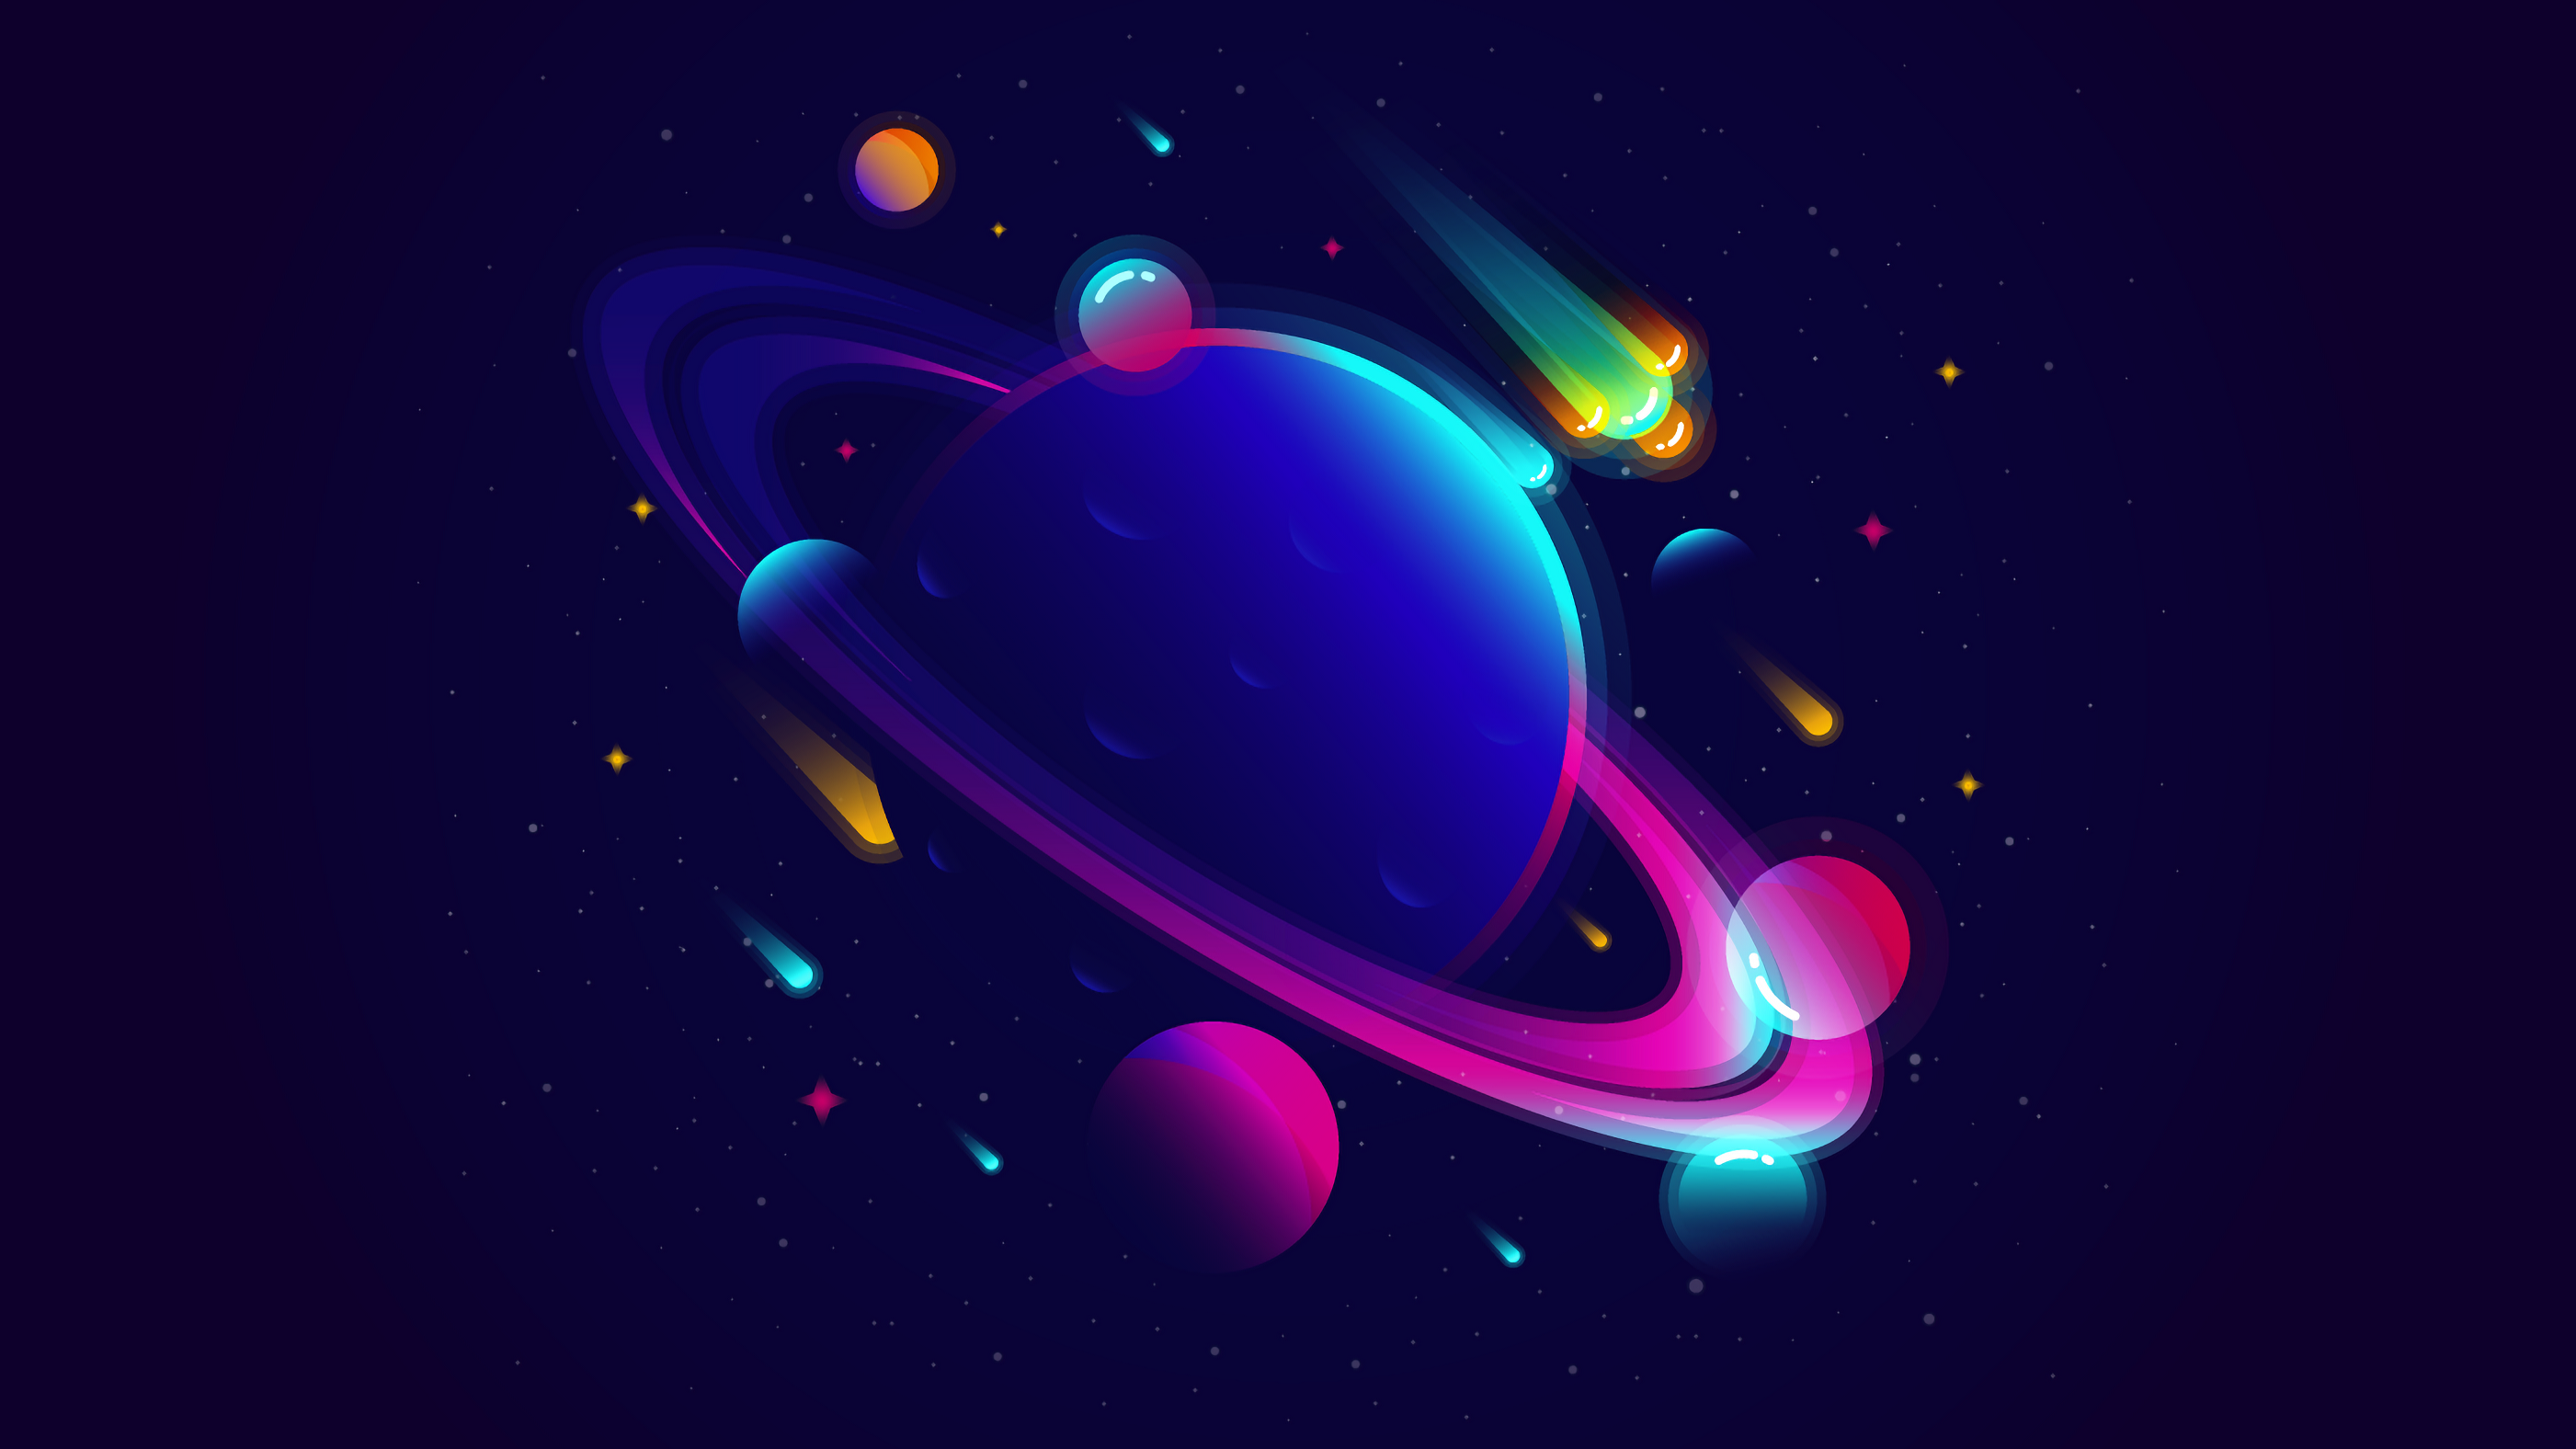 General 2802x1576 vector planet space meteors comet stars gradient digital art